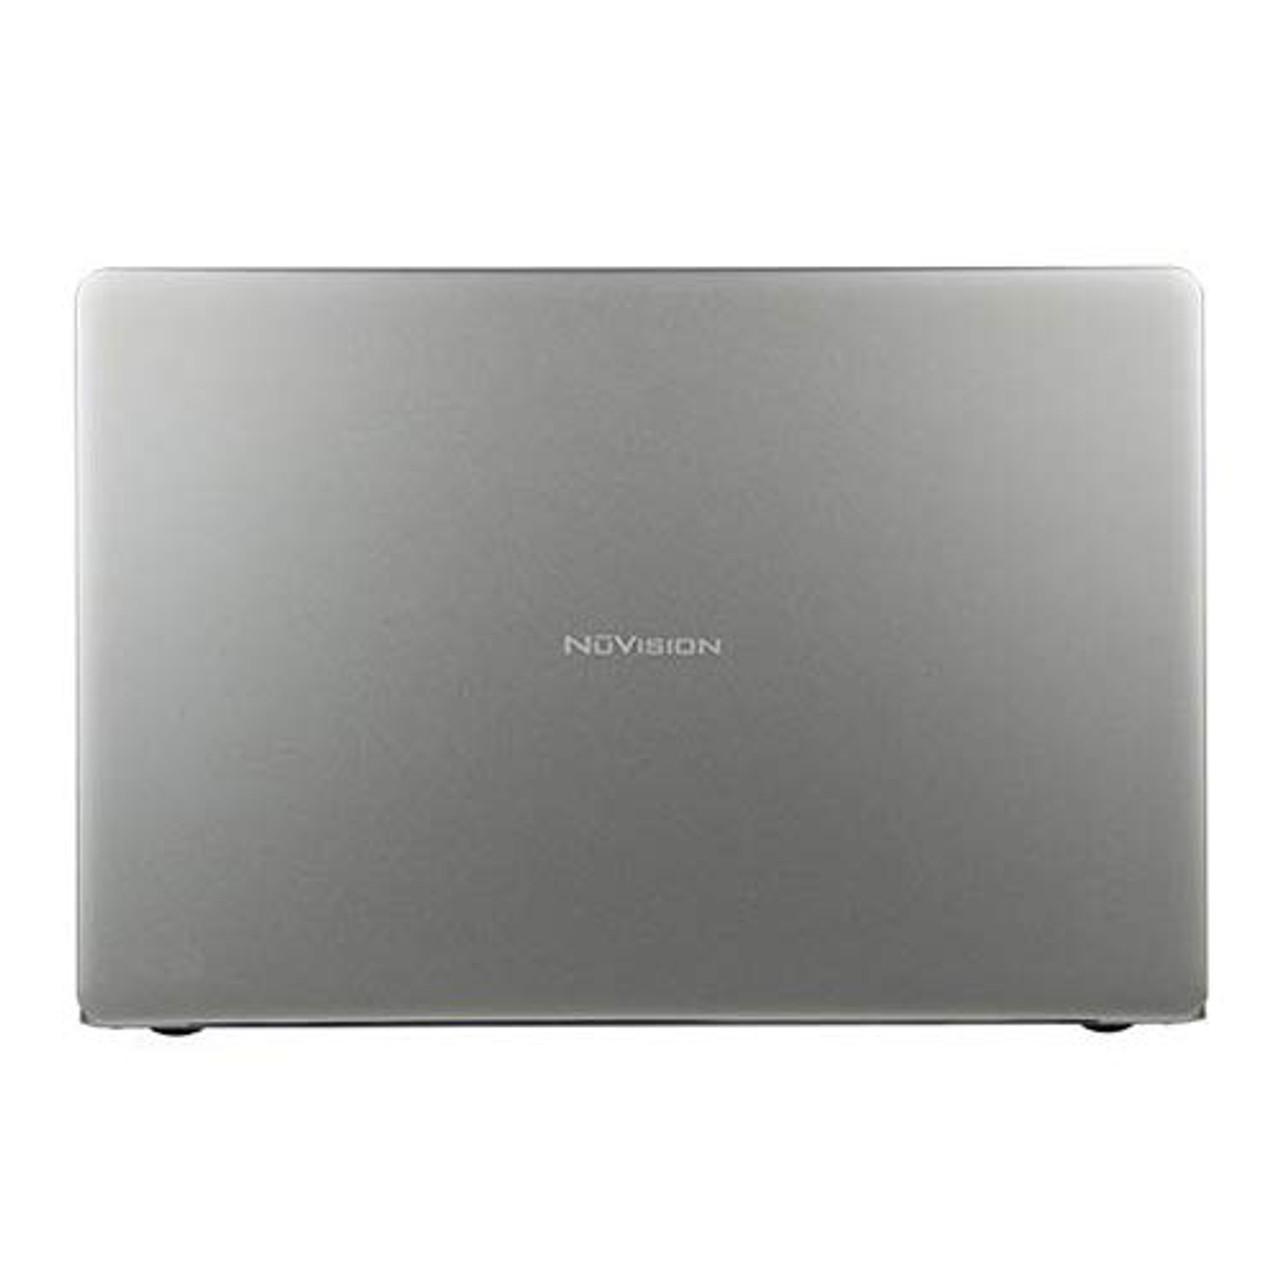 "NuVision Traveler 14 TM141WT720C-RB 14.1"" Business Laptop - Refurbished"